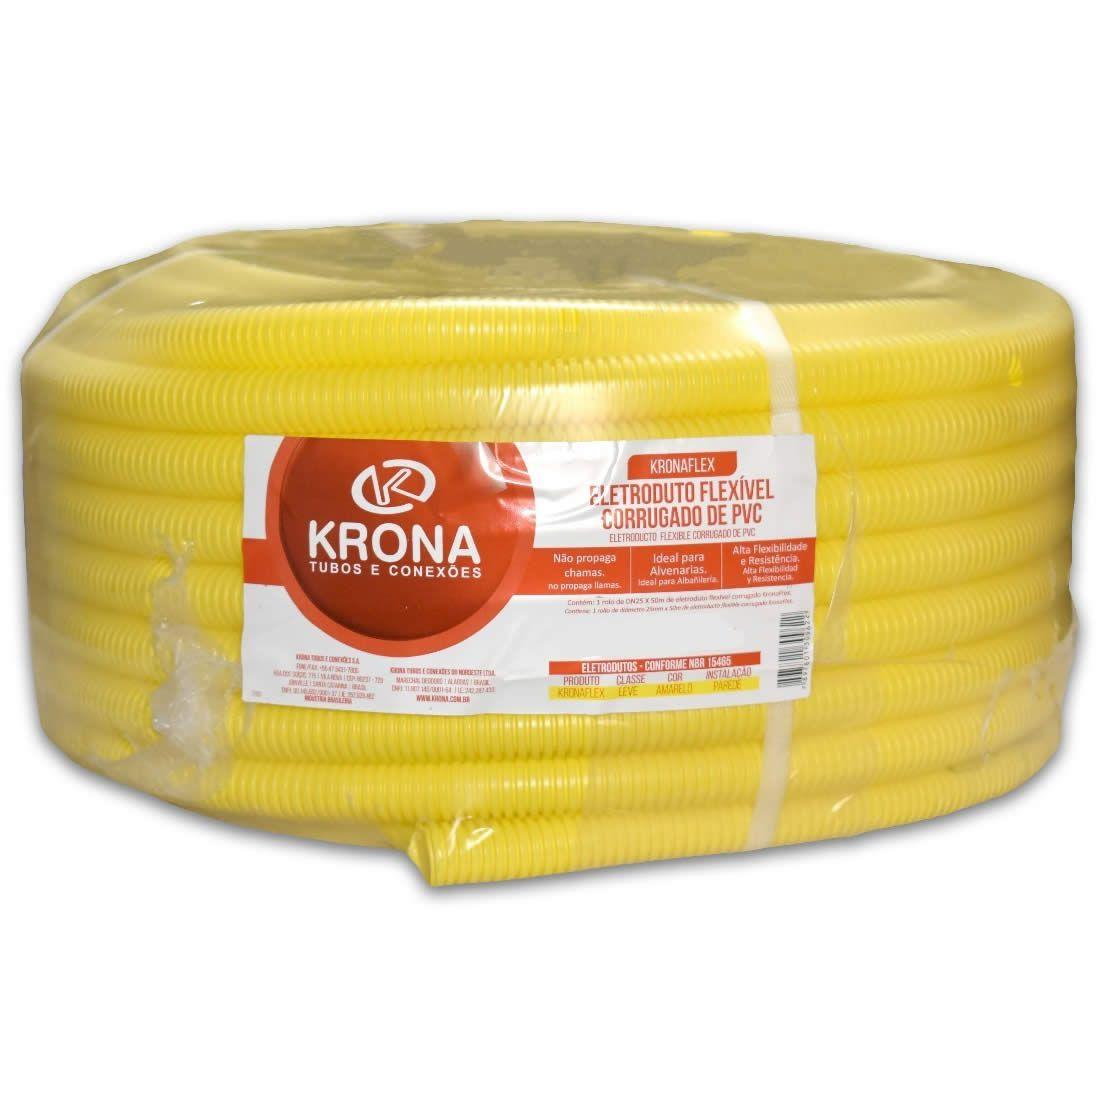 Eletro Corrugado 20mm Rolo Com 50 Metros PVC Krona